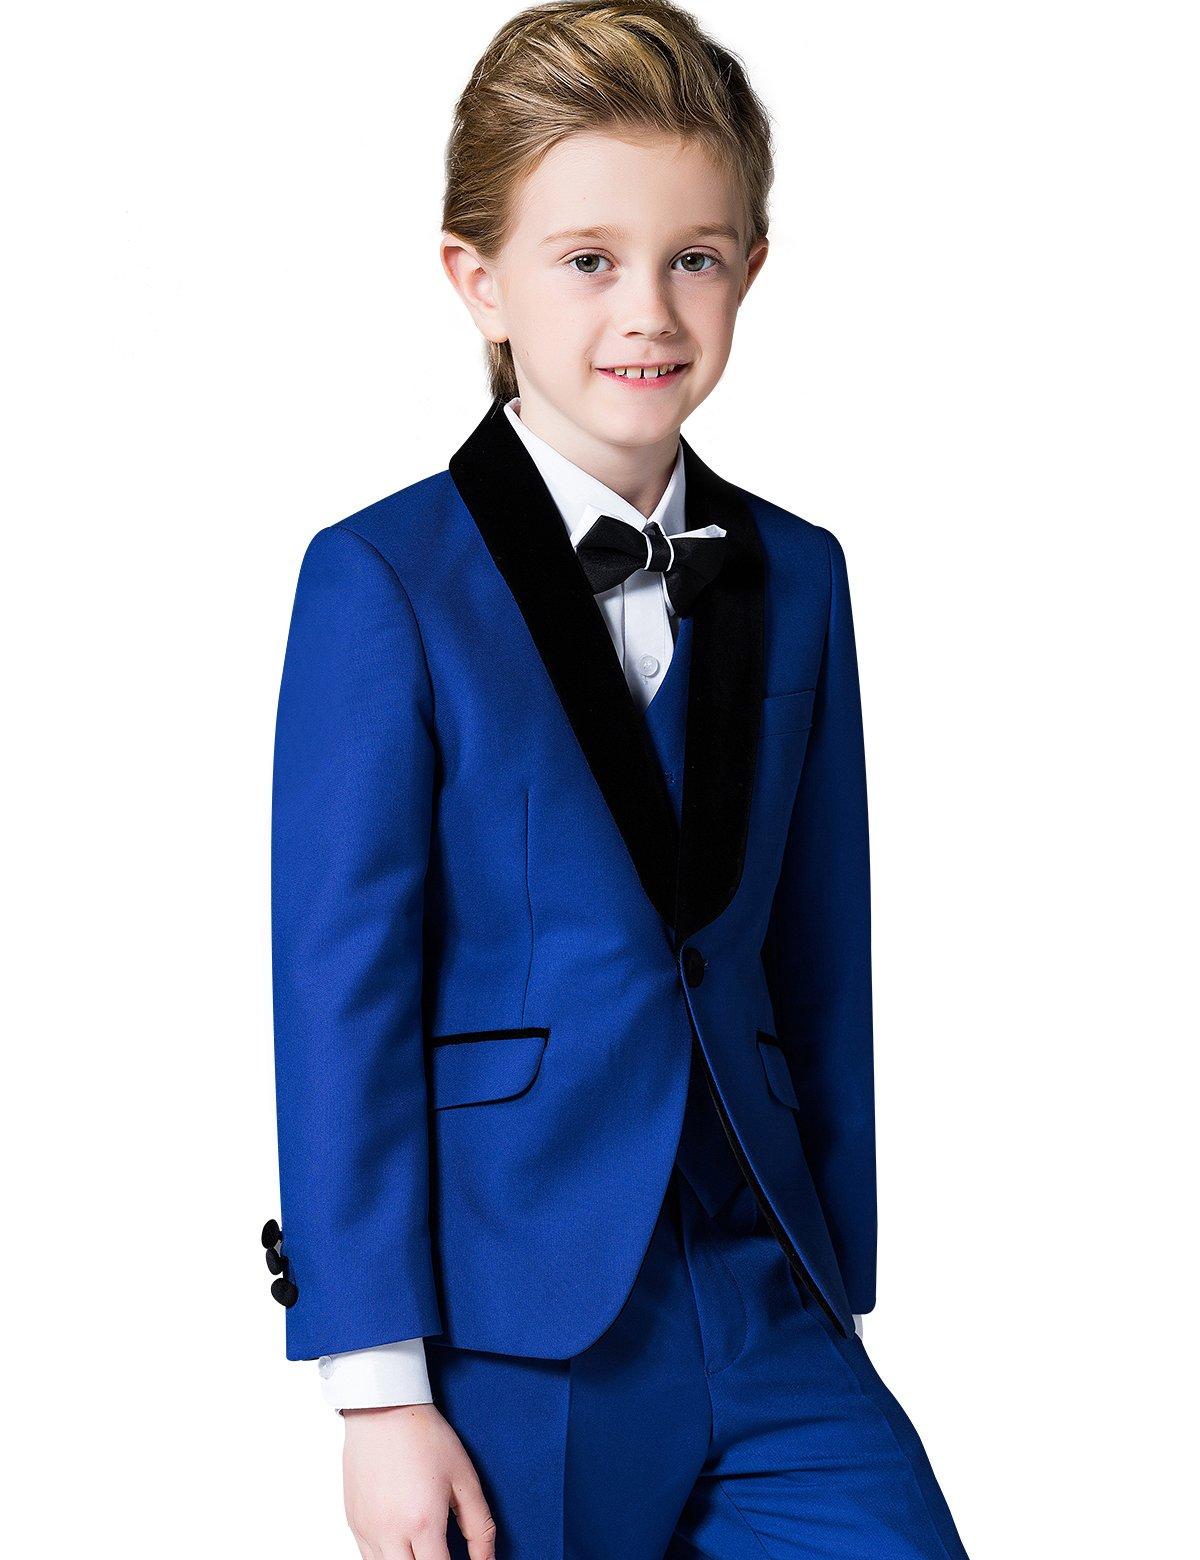 ELPA ELPA Children Suit Solid Color Big Boy 5 Set Boys Wedding Outfits Suits for Teenage